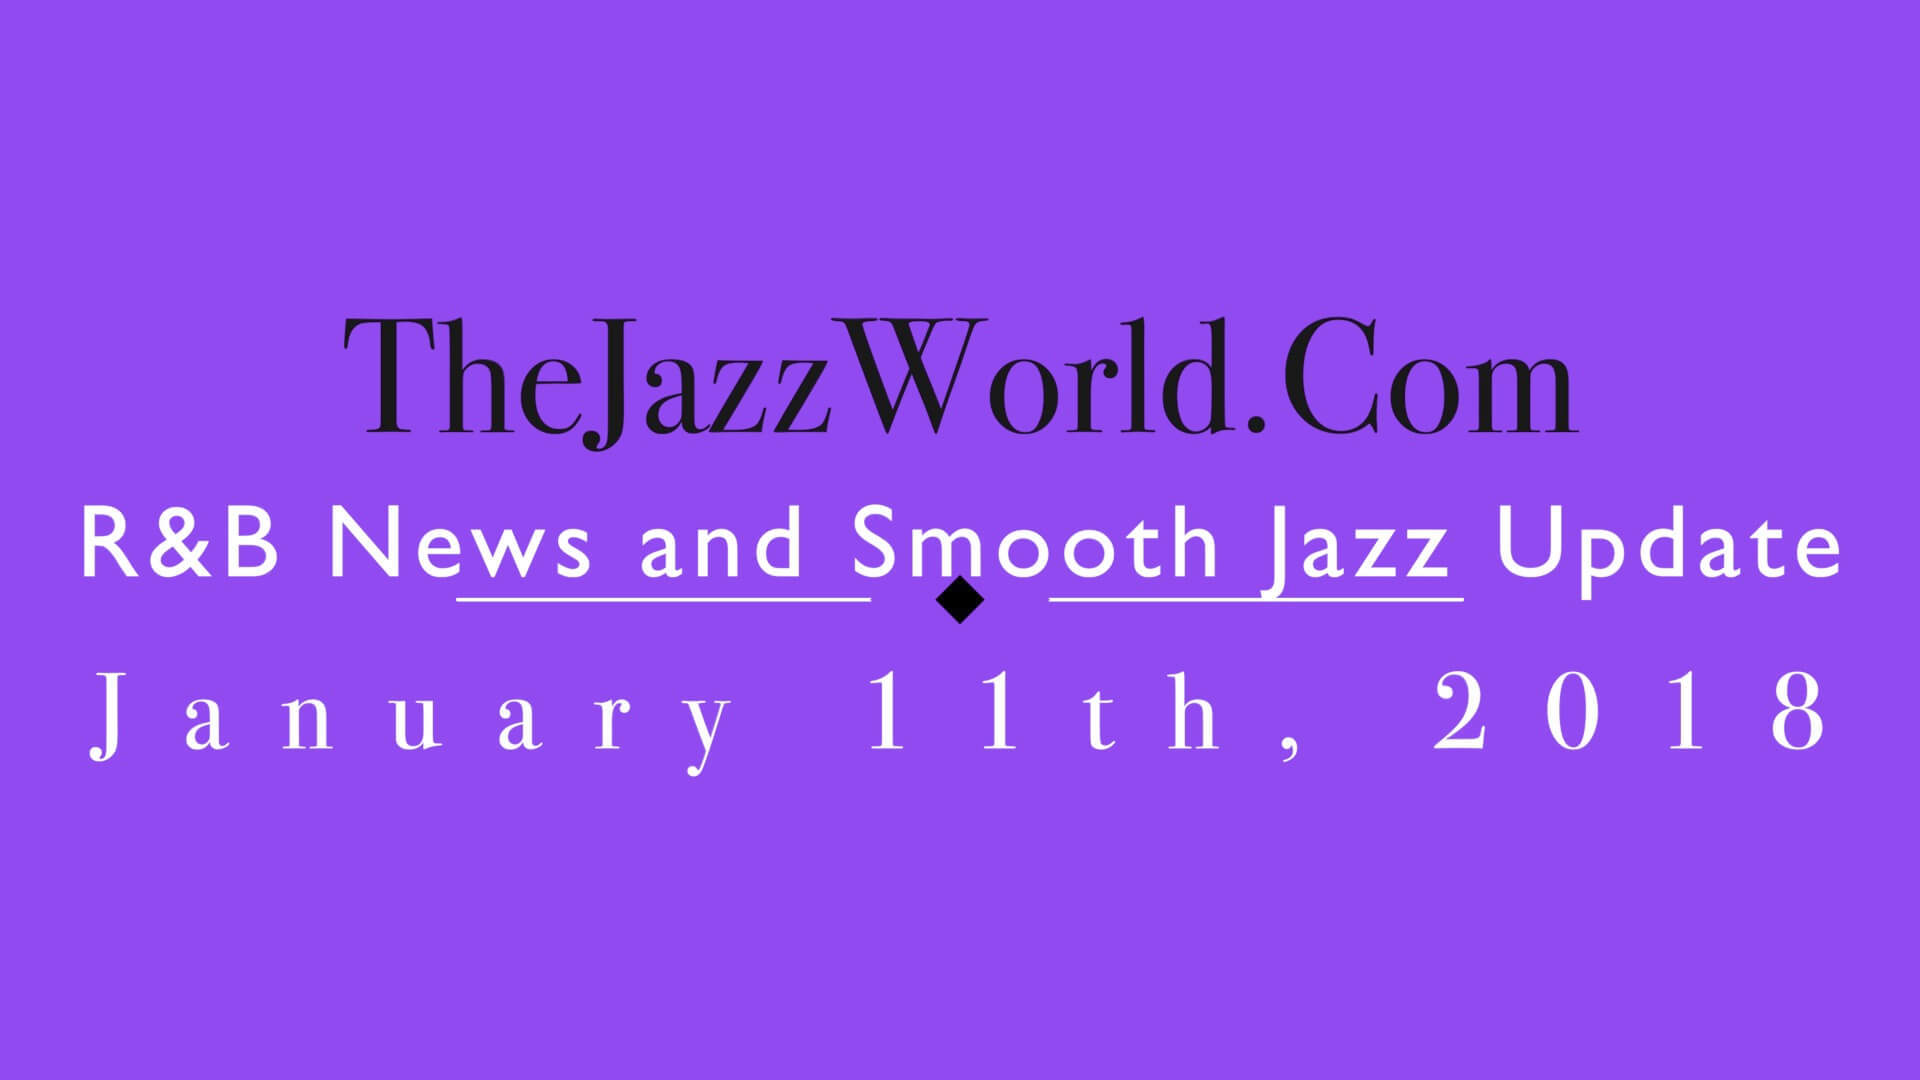 The Jazz World Show 1:11:18